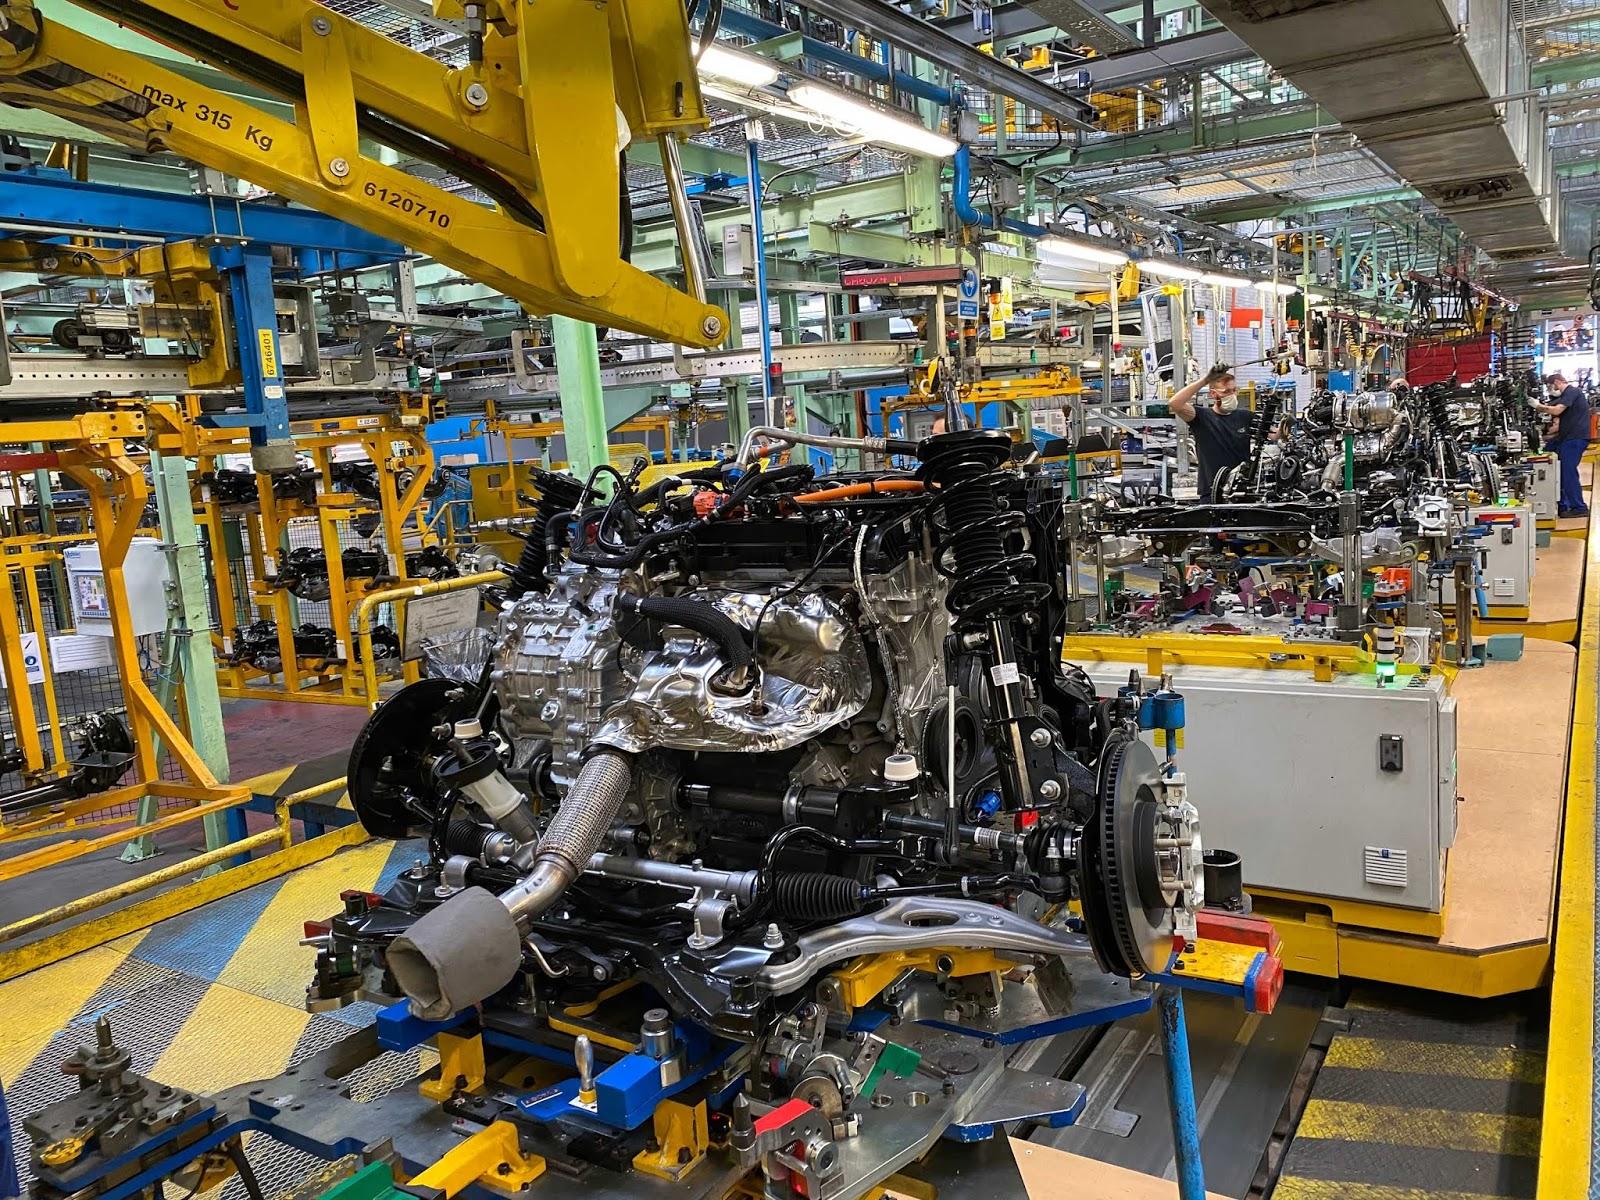 PHEV3 Ford : Νέος υβριδικός κινητήρας, αύξηση της δυναμικότητας και περαιτέρω εξέλιξη των επιβατικών μοντέλων για ένα αμιγώς ηλεκτρικό μέλλον